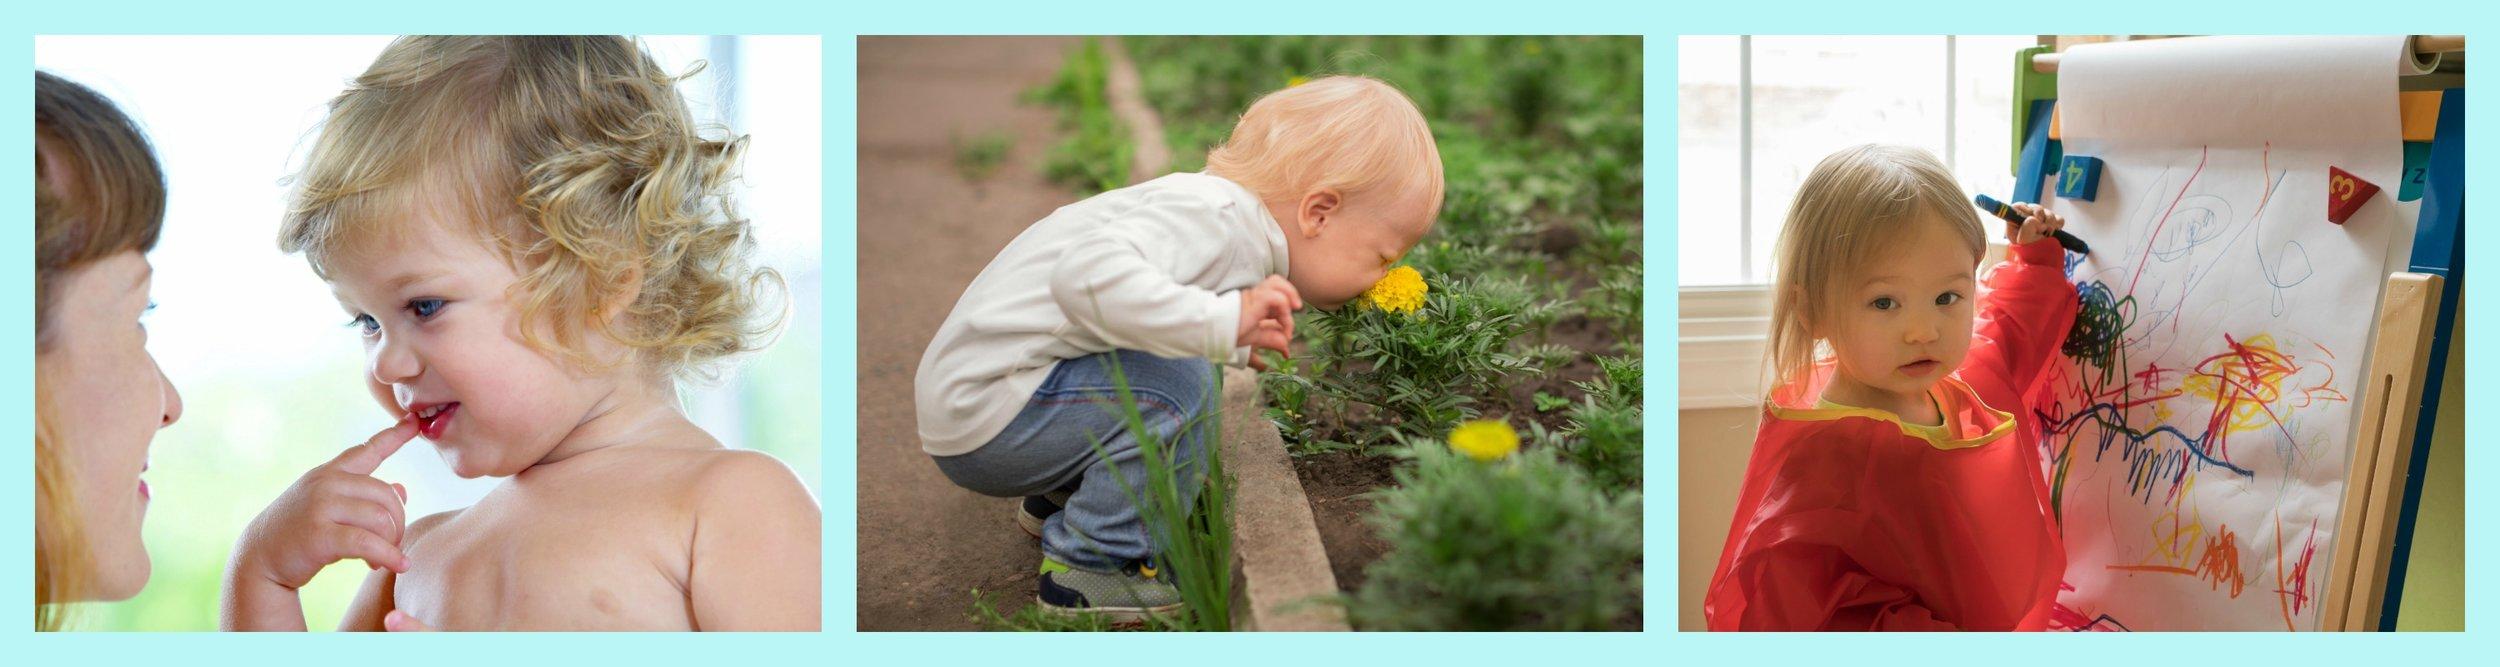 Teach+Your+Toddler+-+Toddler+Development+Course.jpeg